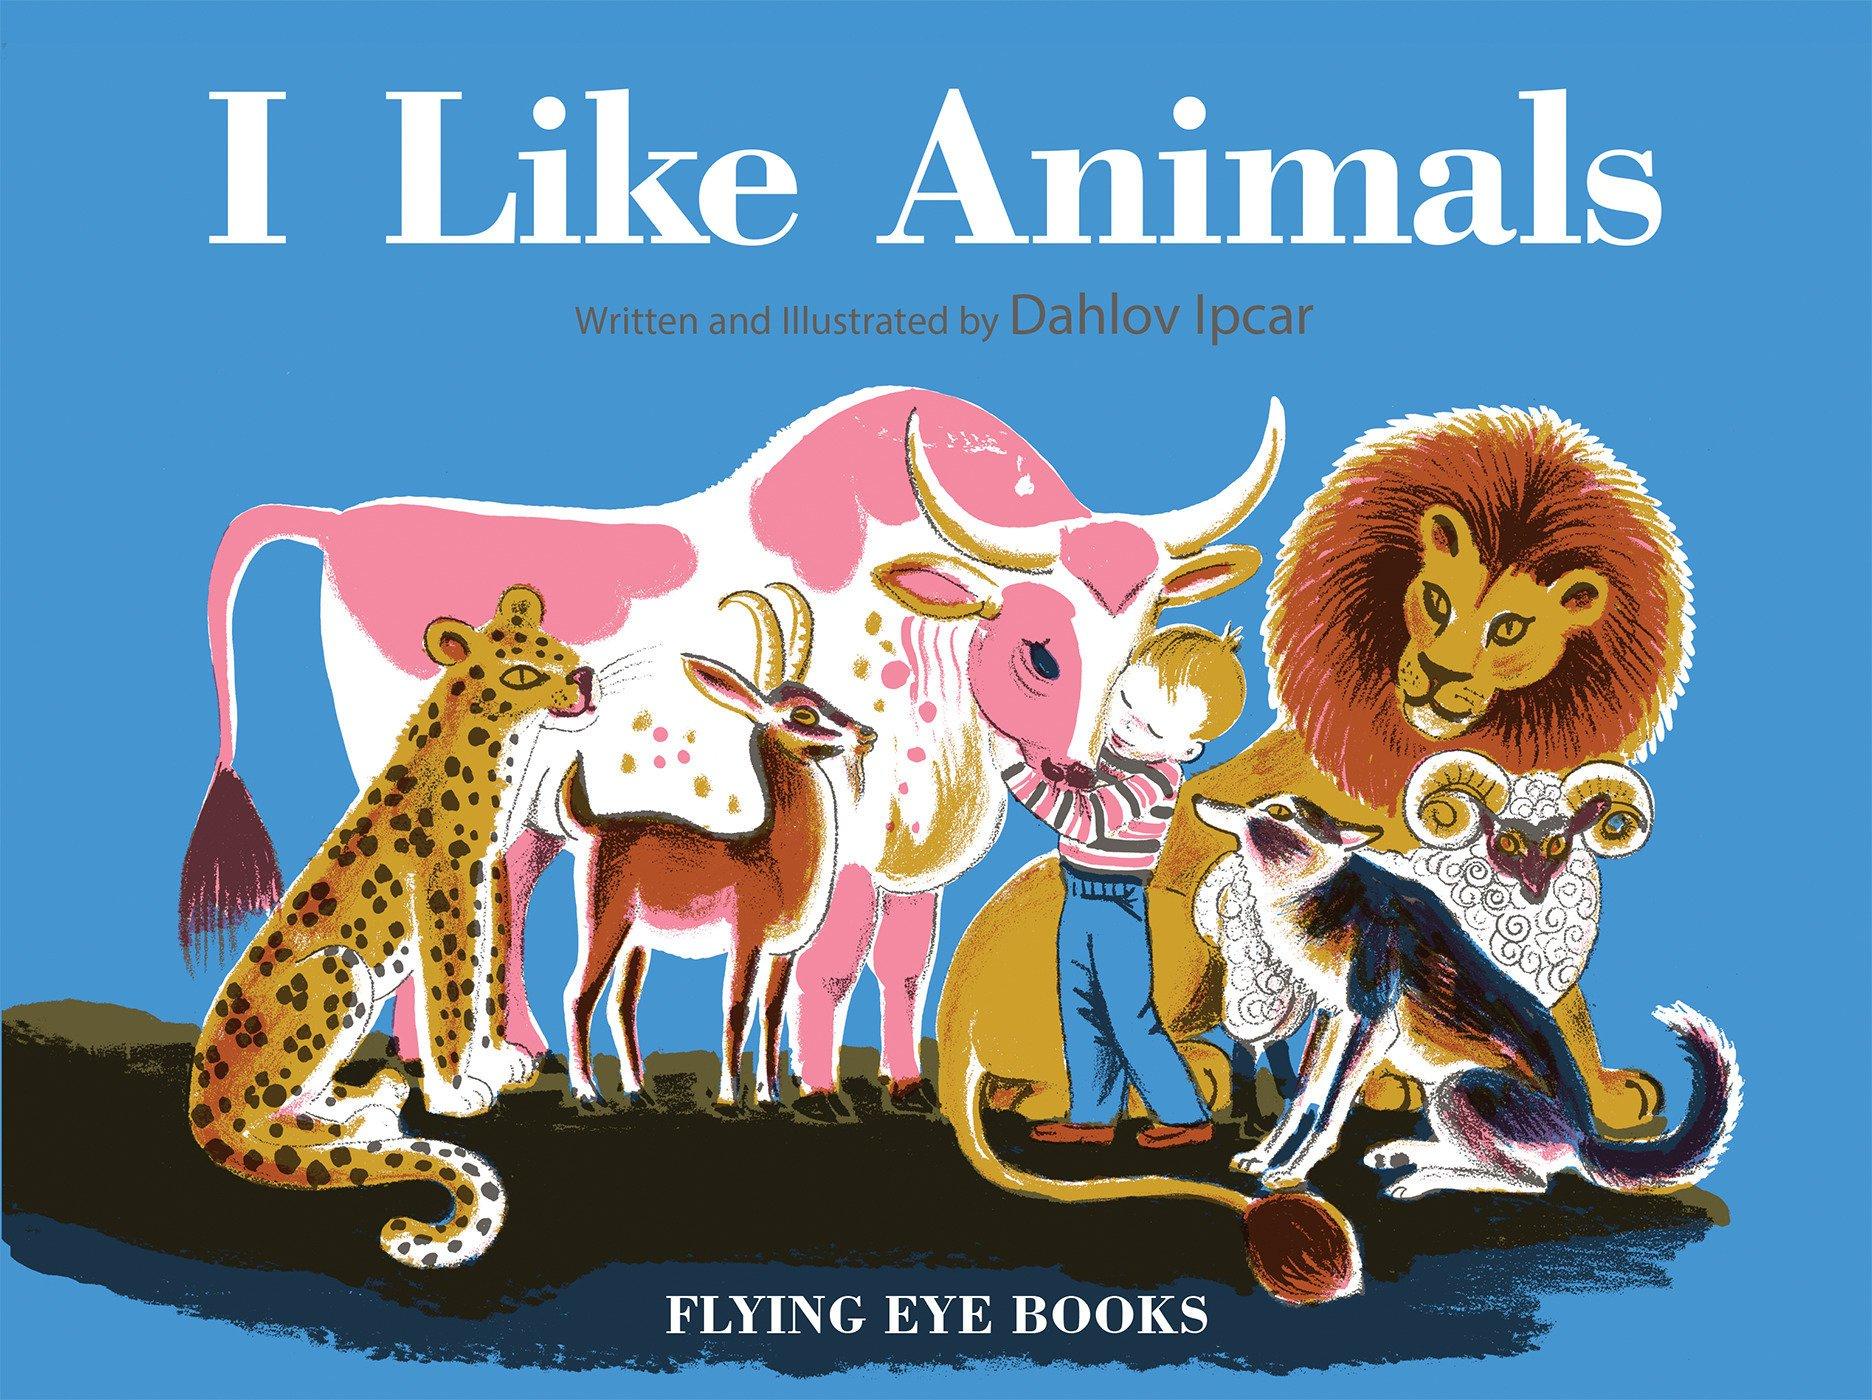 I Like Animals (Dahlov Ipcar Collection)